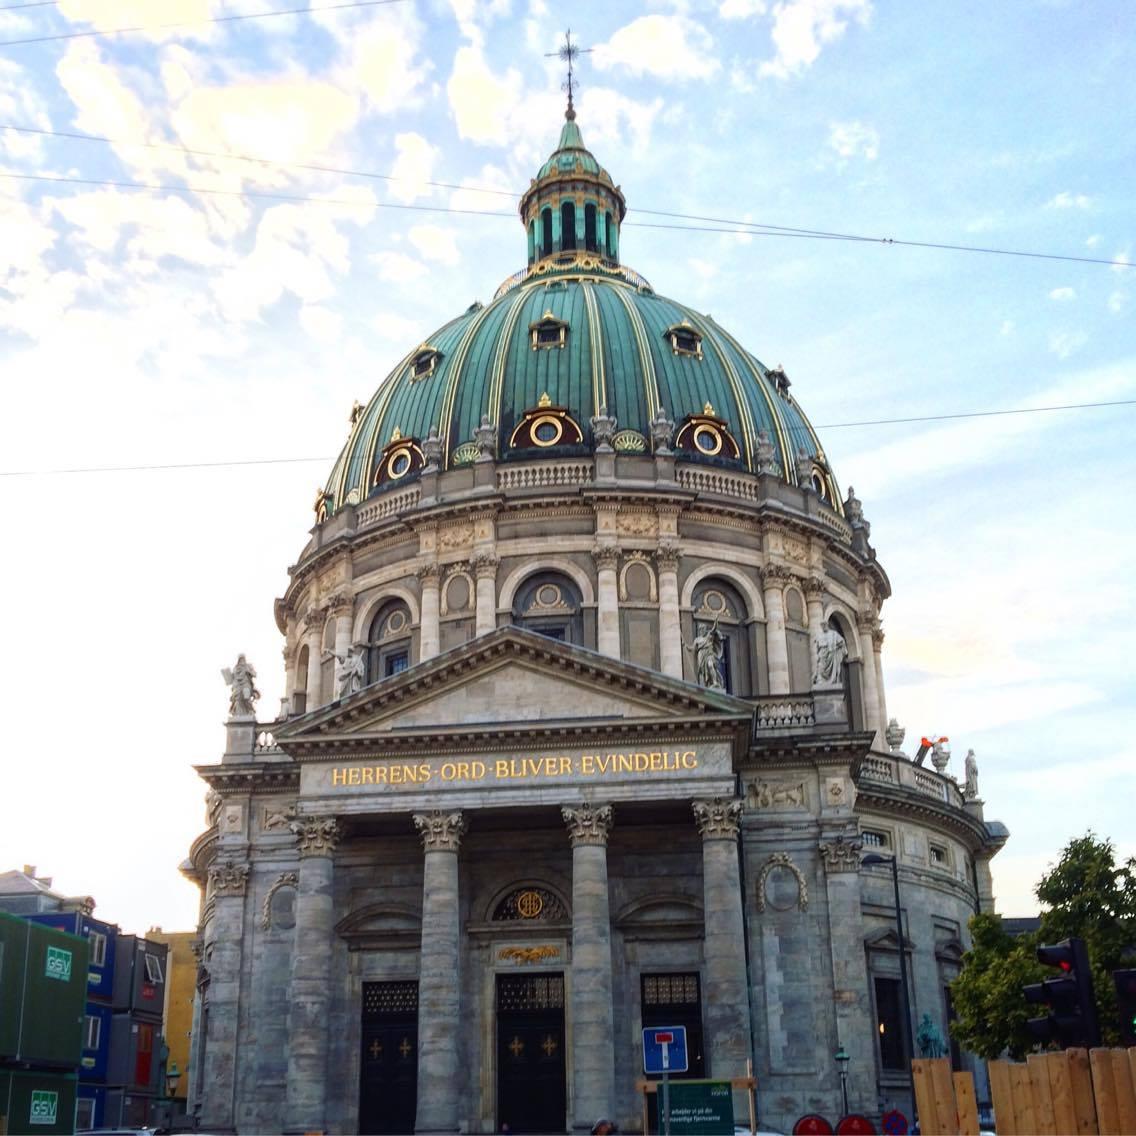 Top Things to do in Copenhagen, Denmark - Fredrik's Church